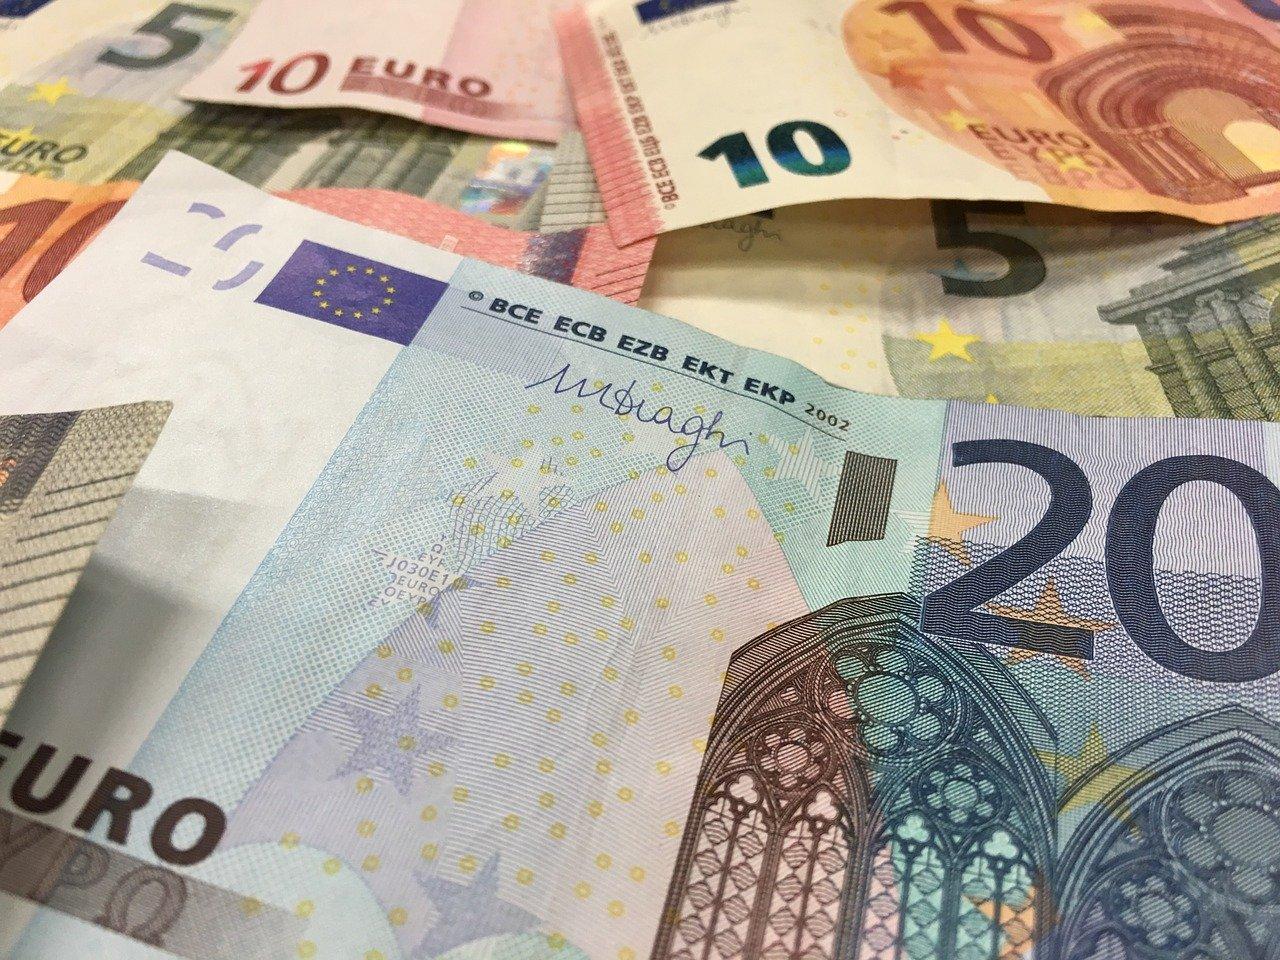 Aumento stipendi statali 2020